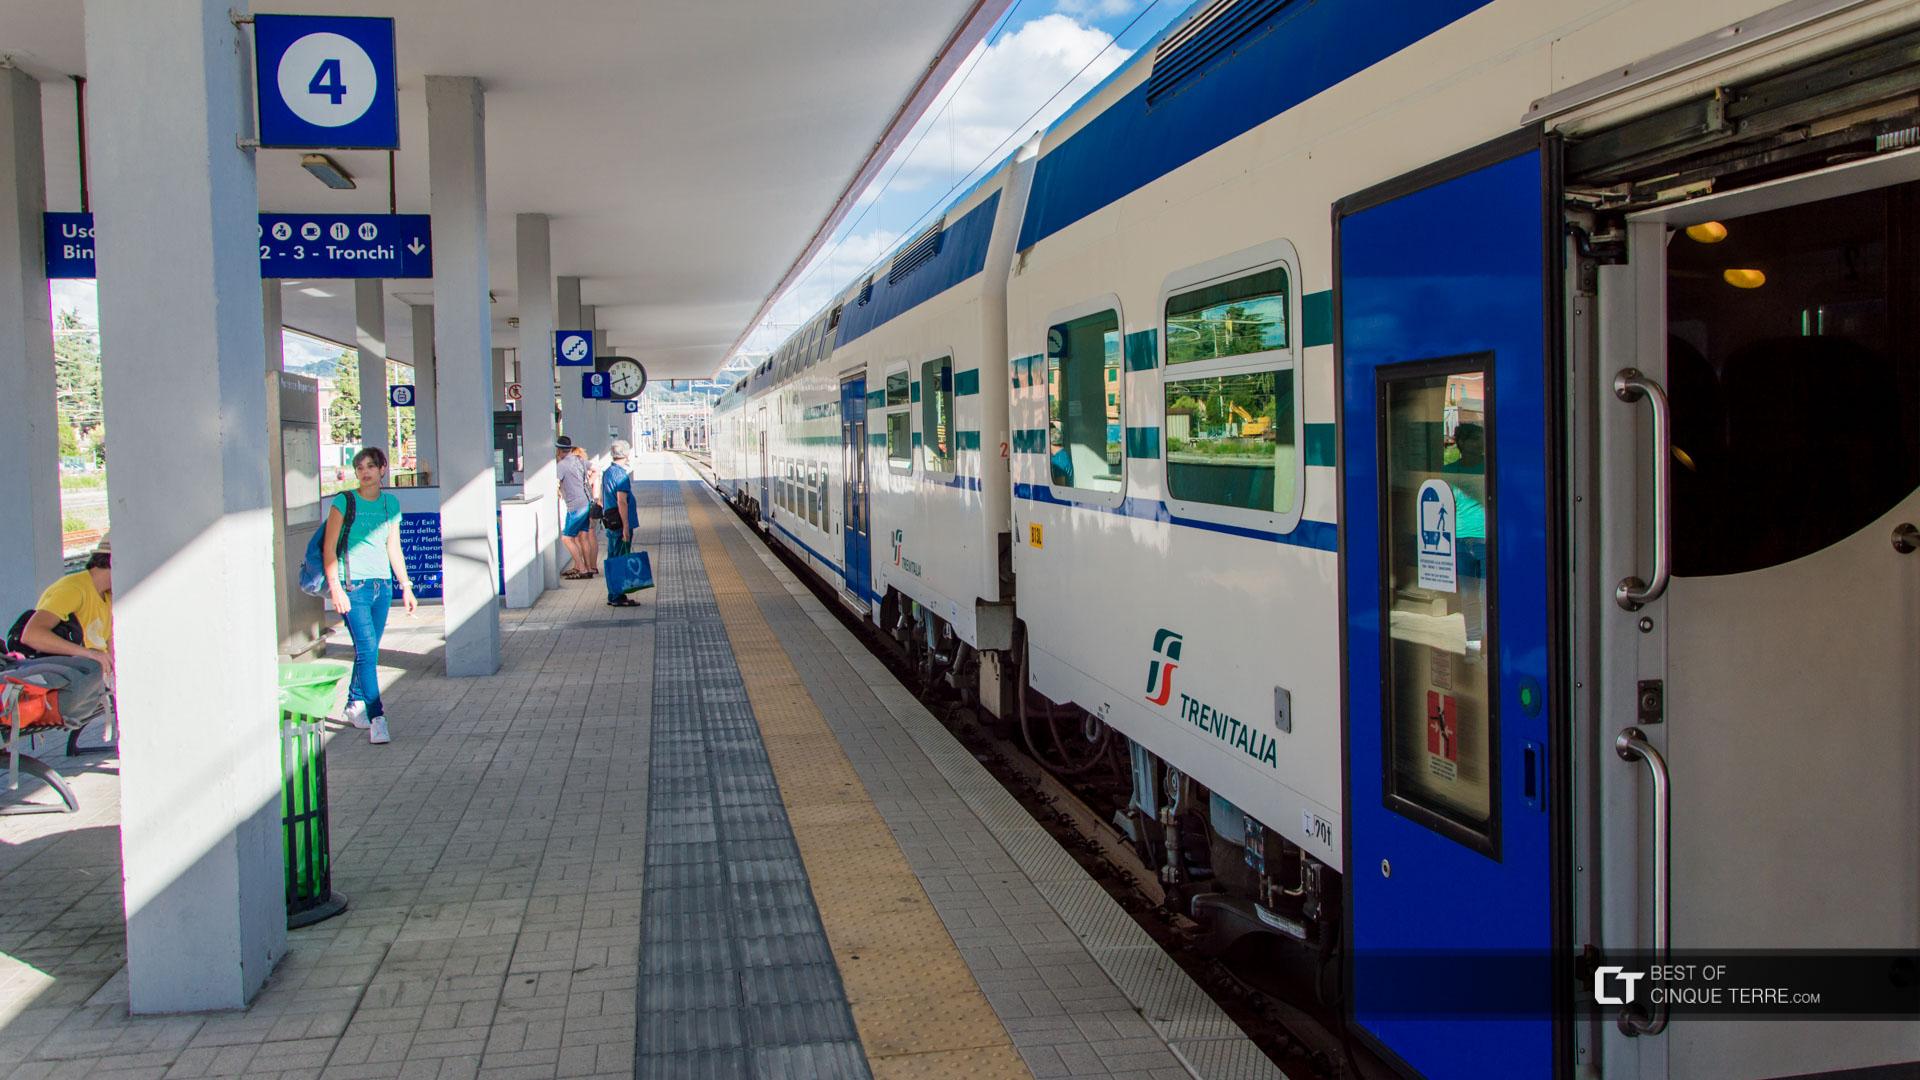 Hotels In La Spezia Italy Near Train Station